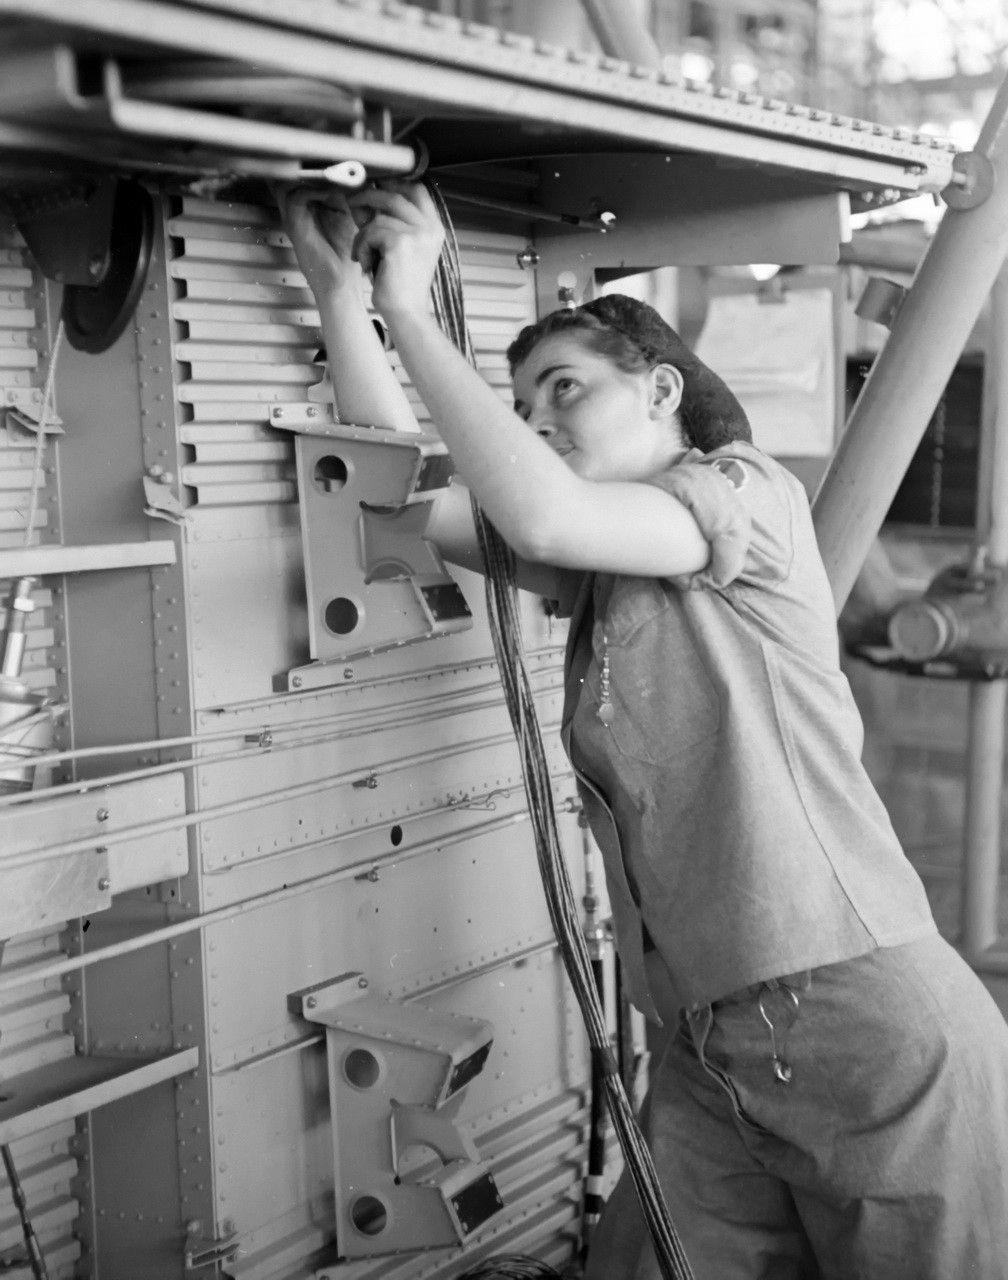 Diverses photos de la WWII - Page 3 8926